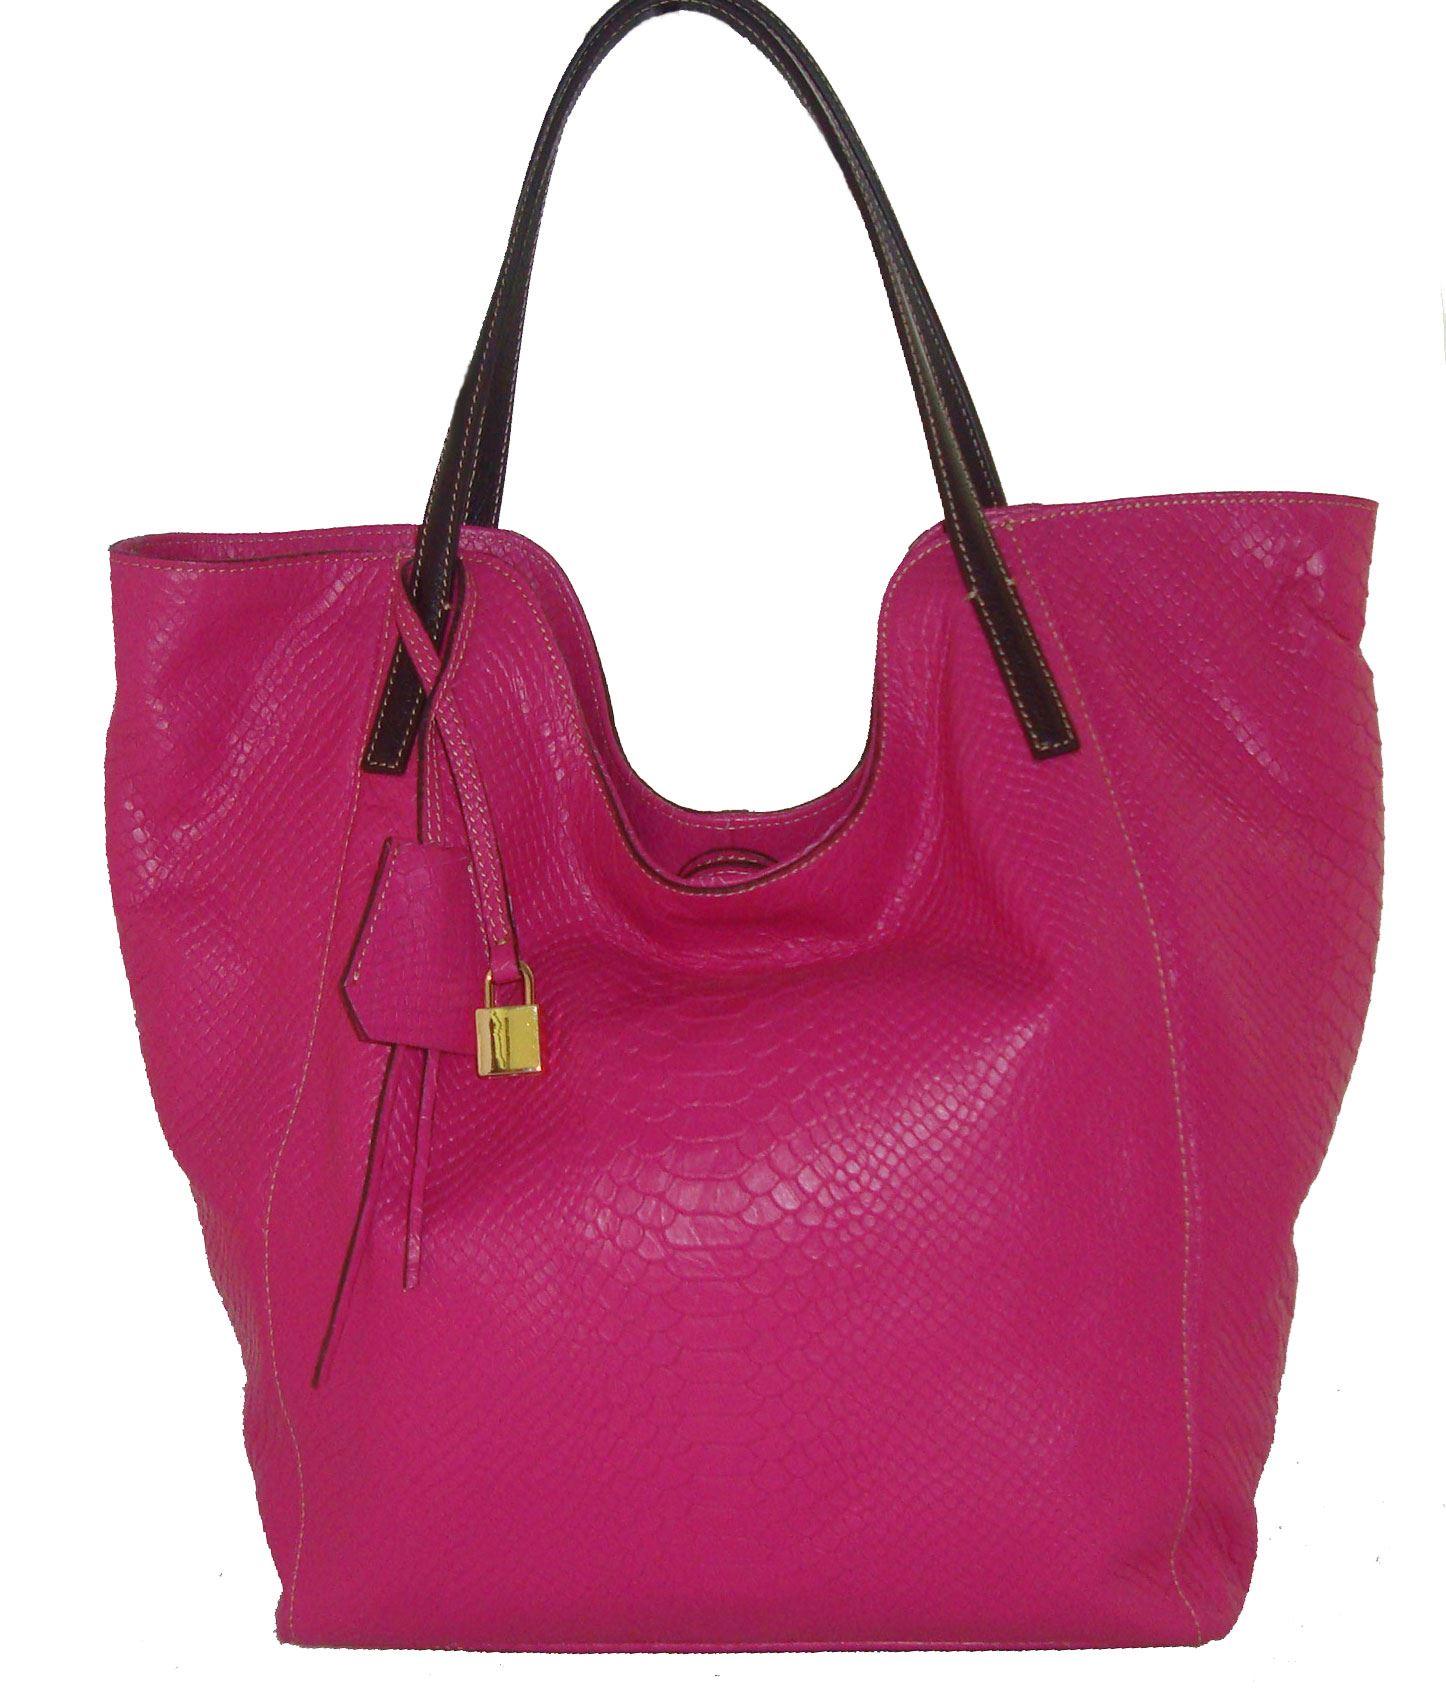 15faf79923 Εικόνα της Ιταλική δερμάτινη γυναικεία τσάντα - LUI-015 fouxia